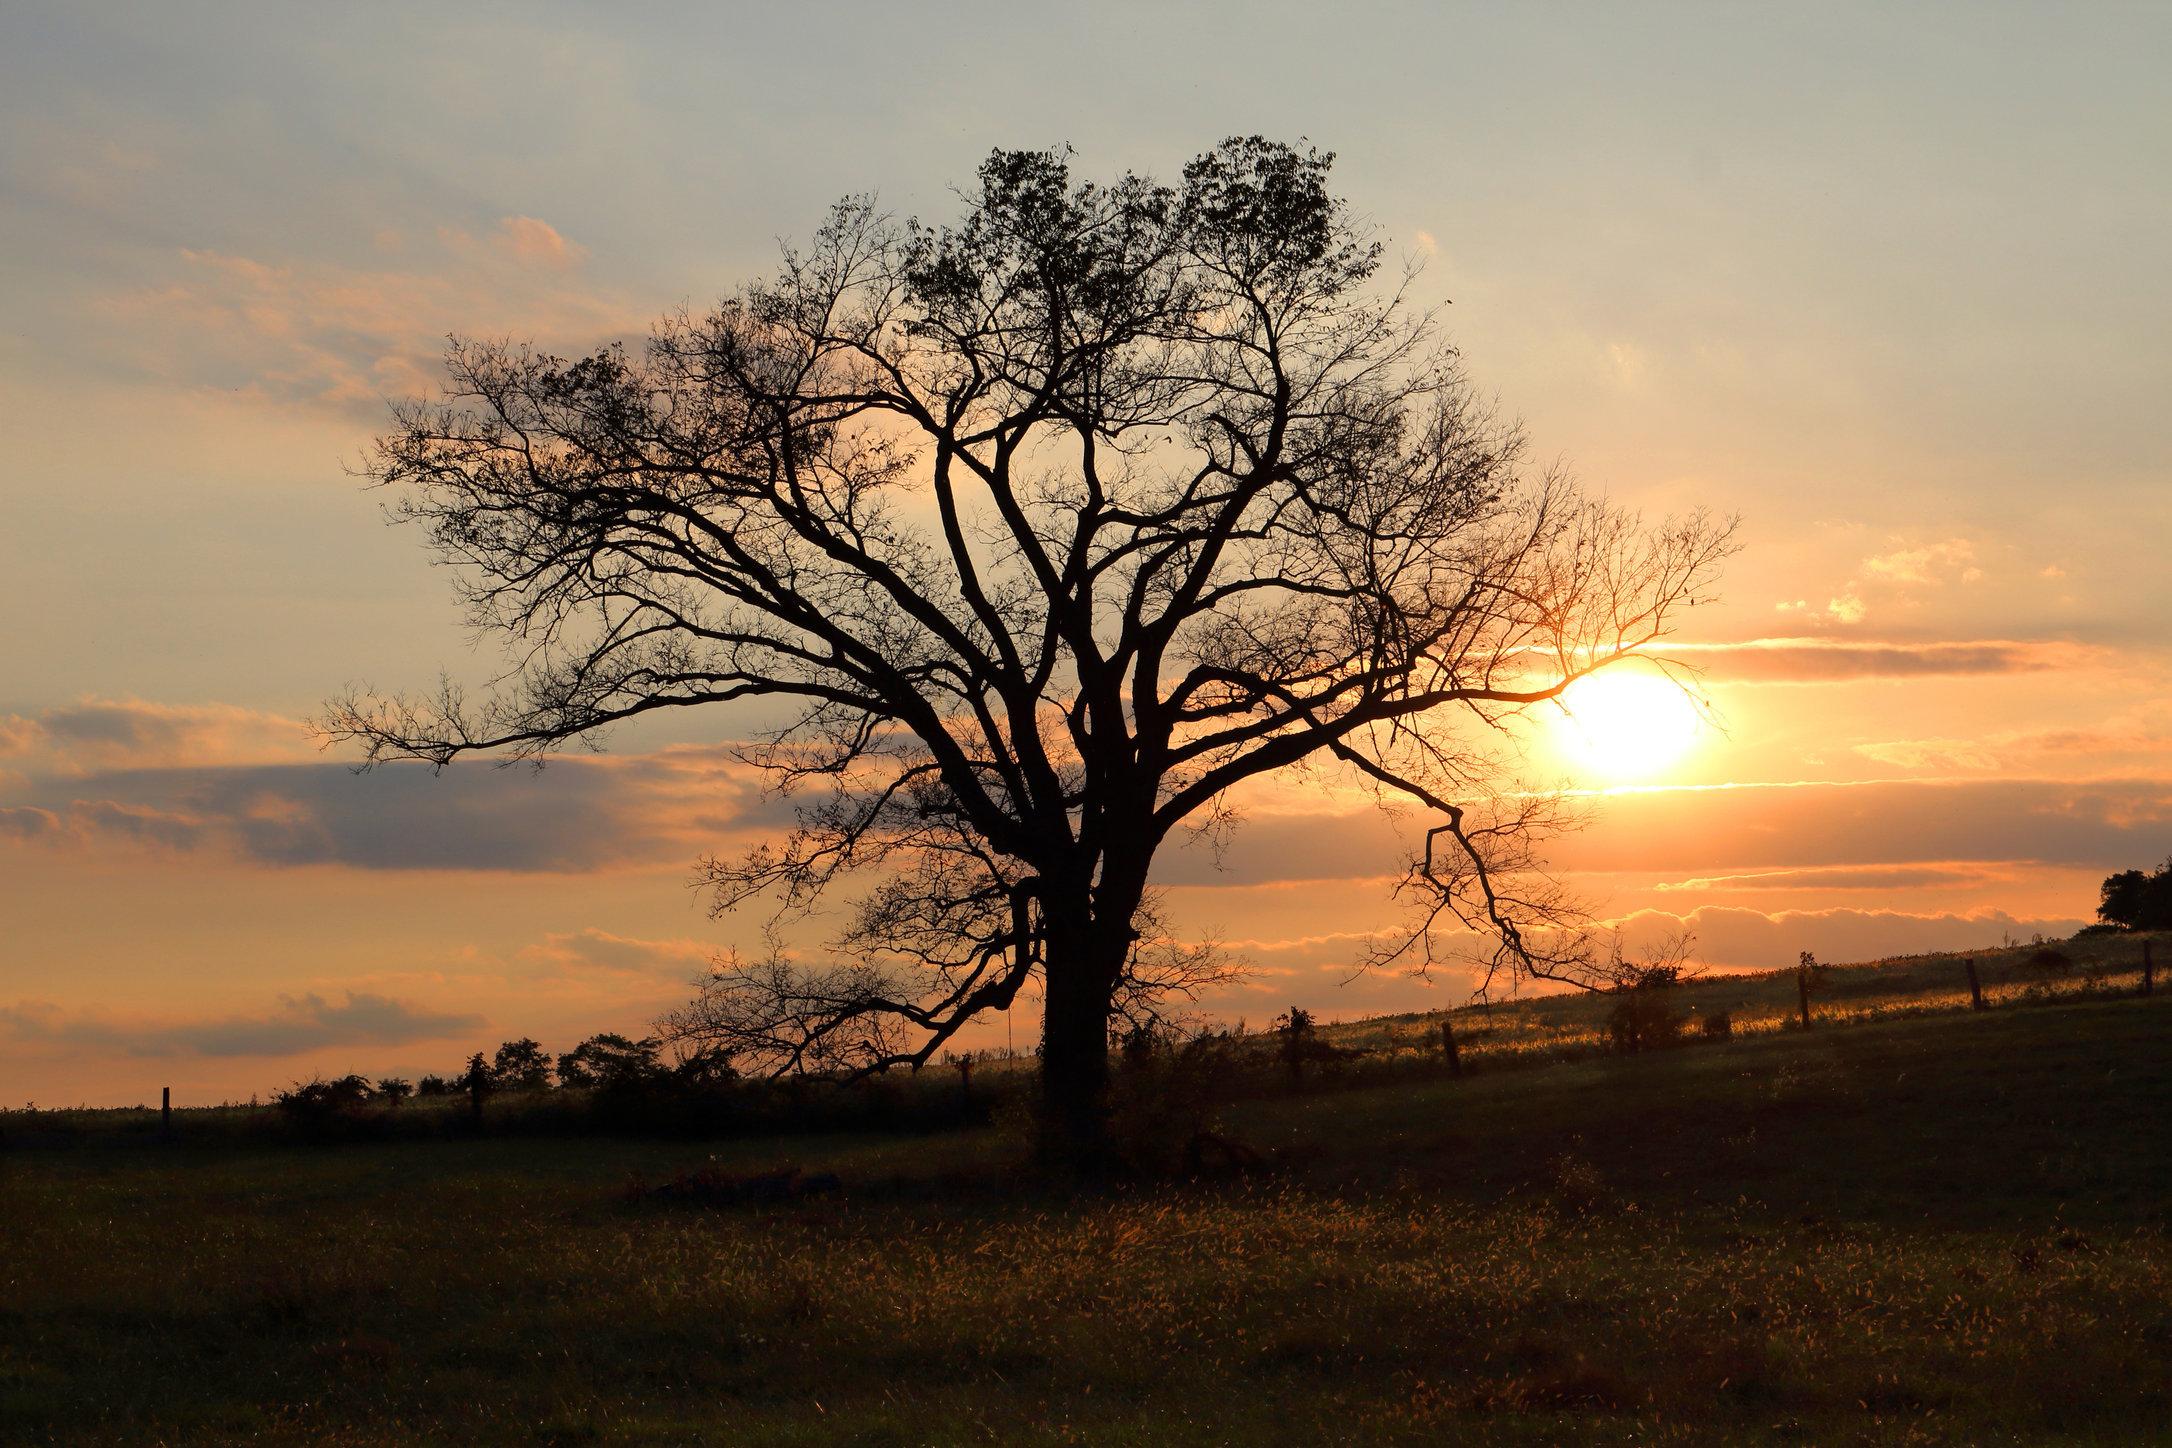 Sunset, southern Ohio